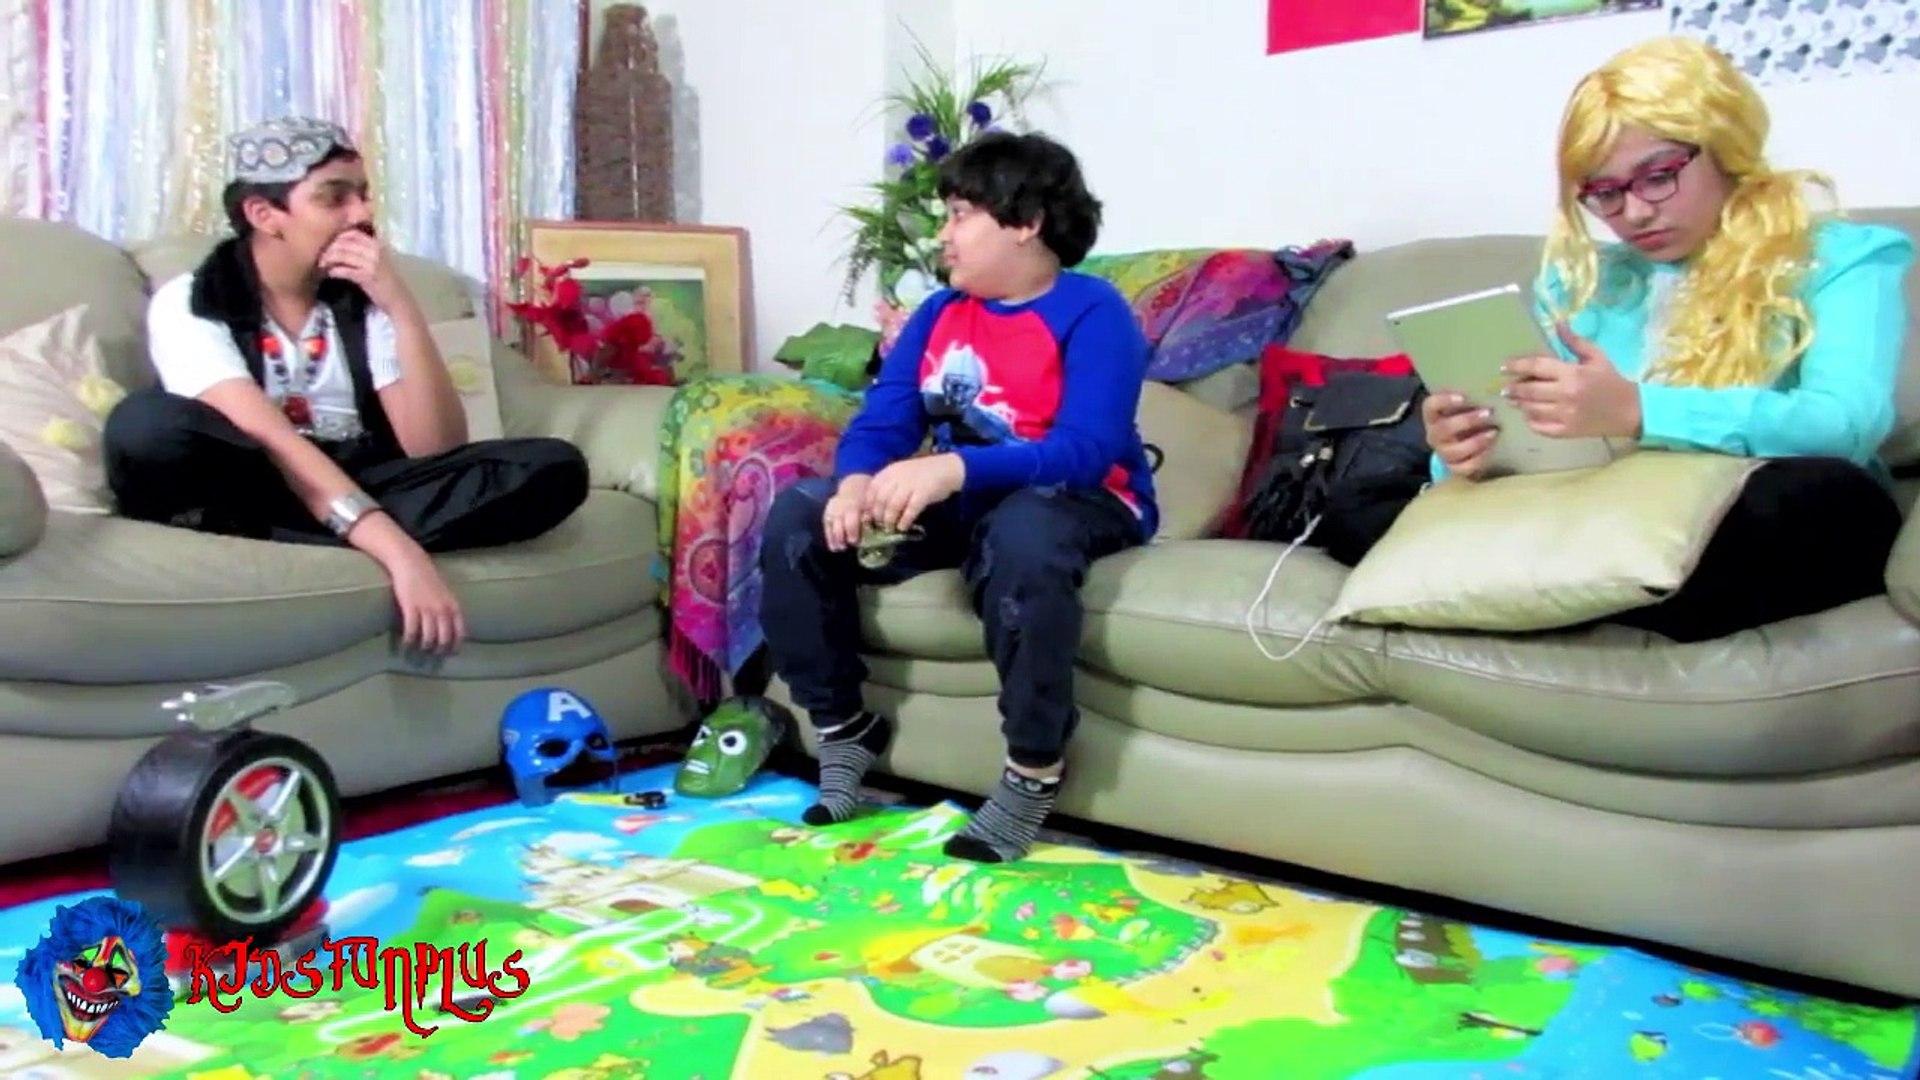 Scary Killer Clown A GENIE AND A MUMMY? Episode 14 :: Kids Fun Plus